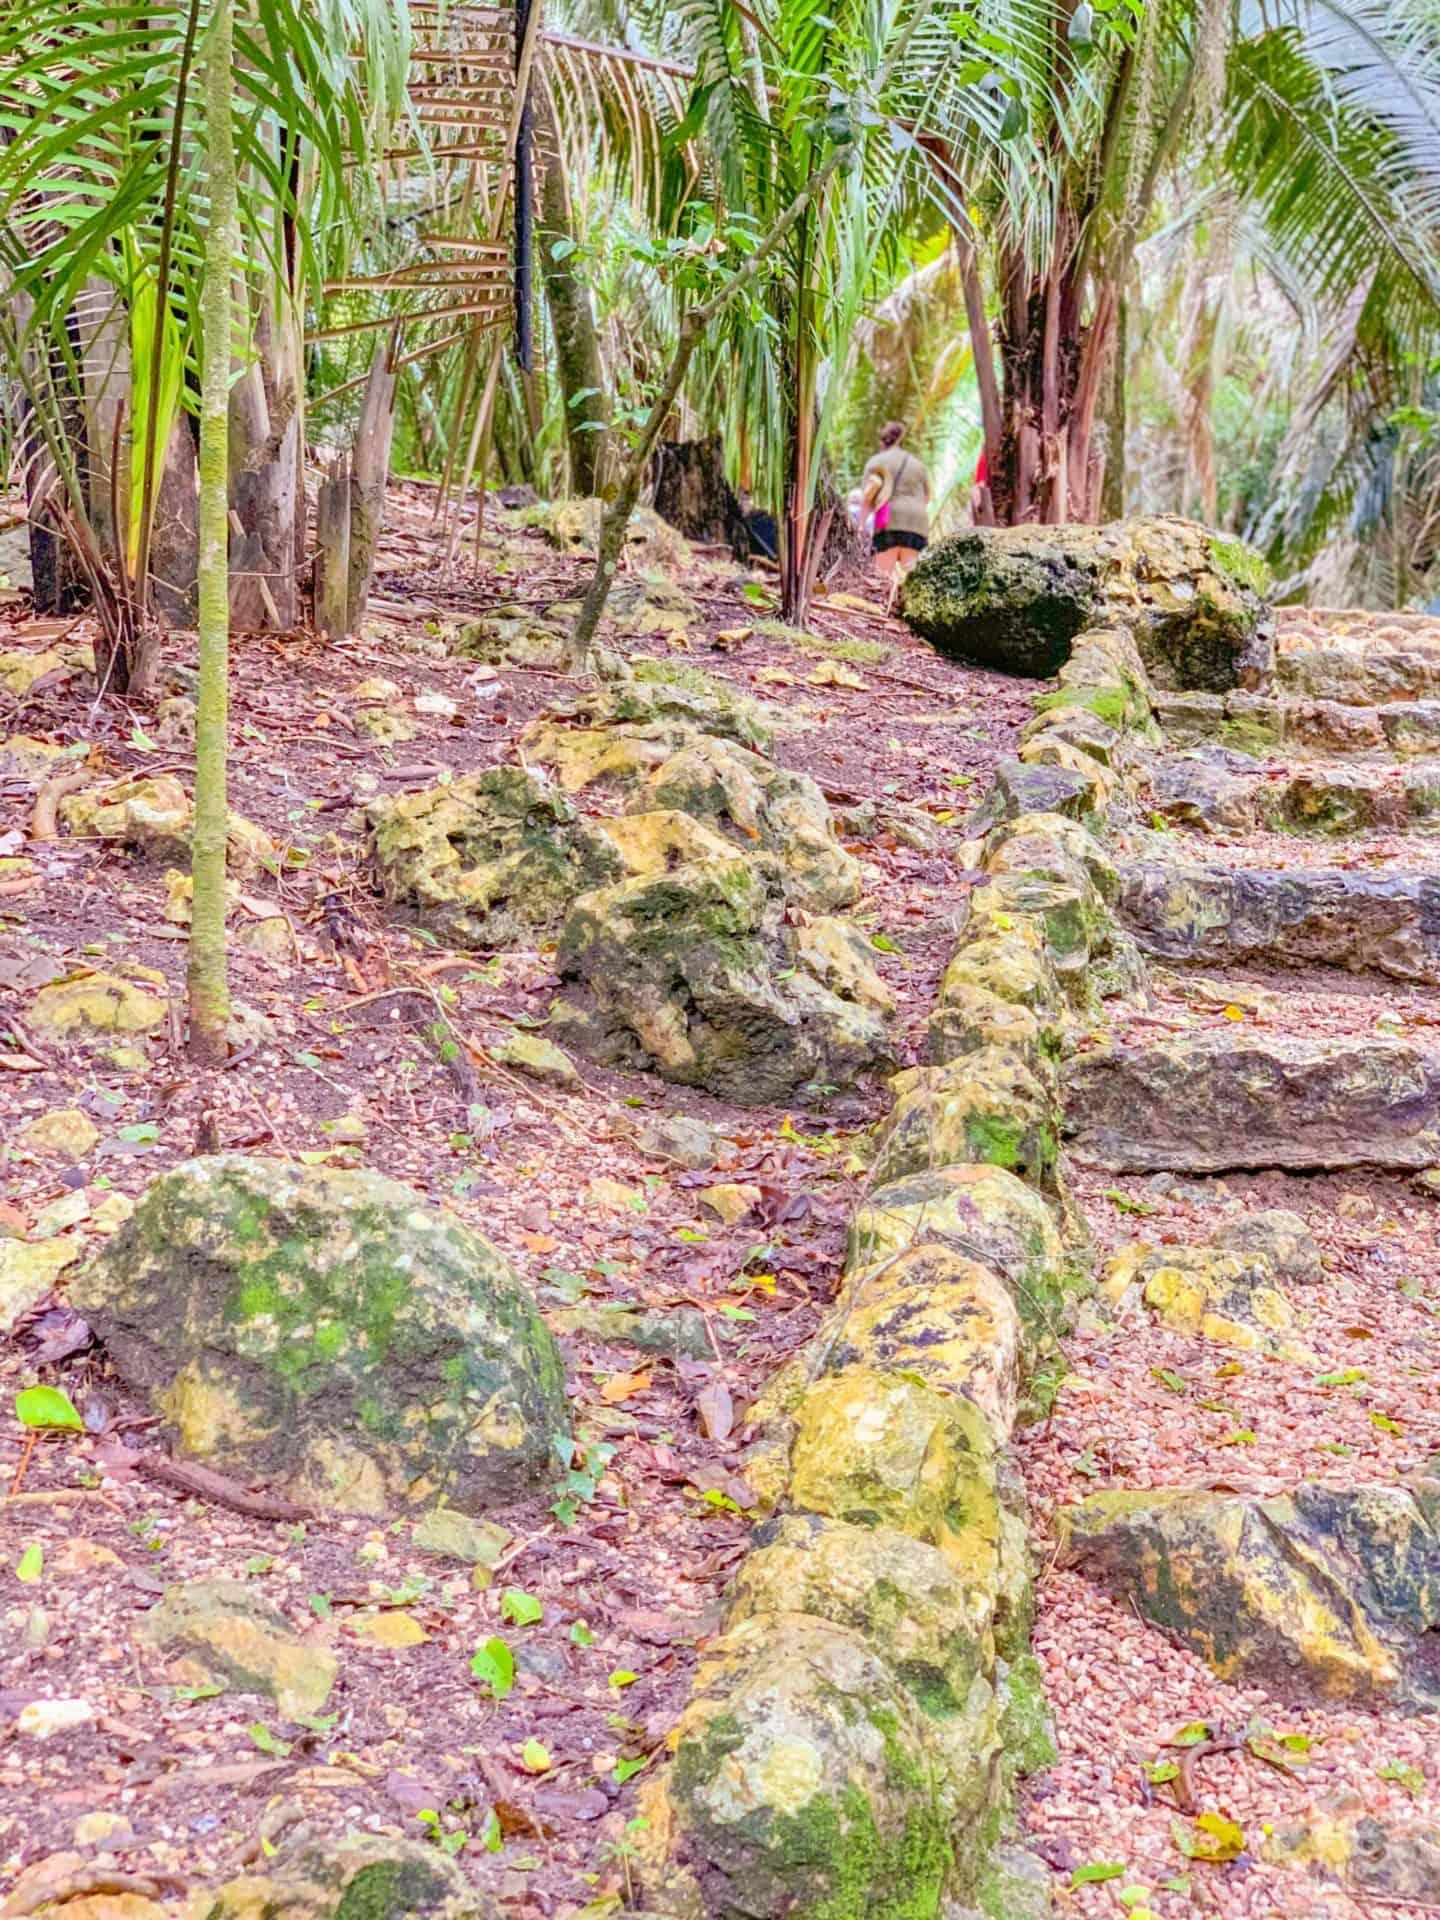 Hiking the Mayan Ruins In Belize | Shaunda Necole